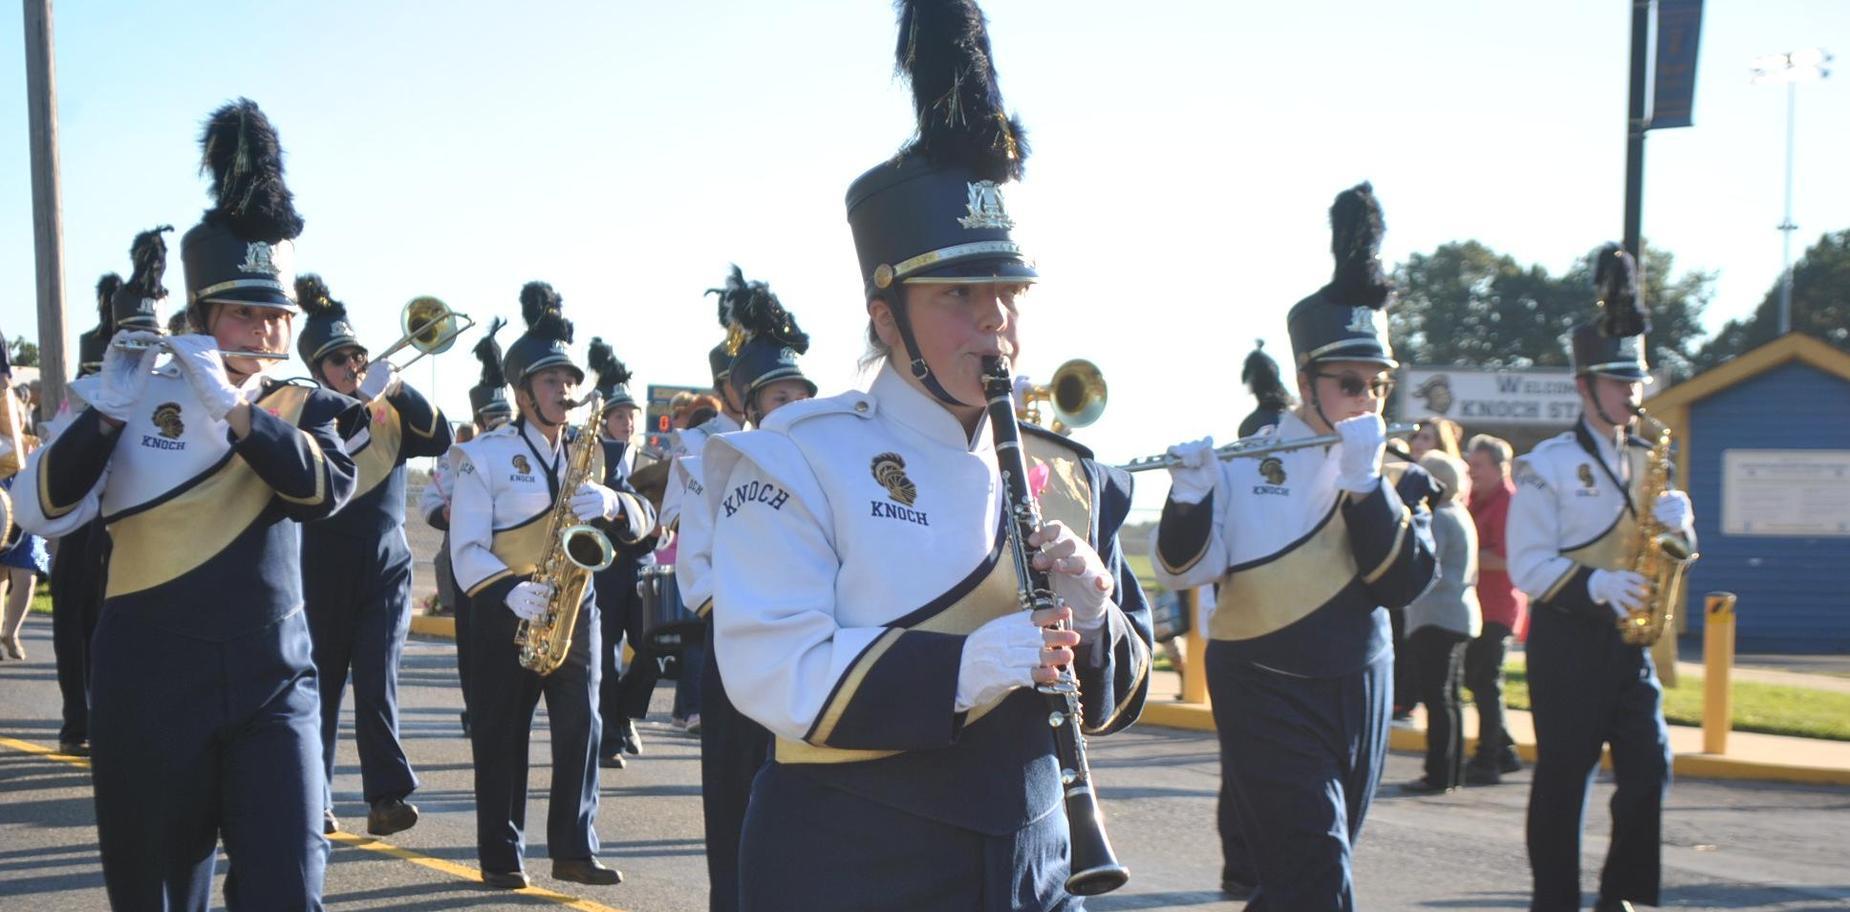 band members in parade